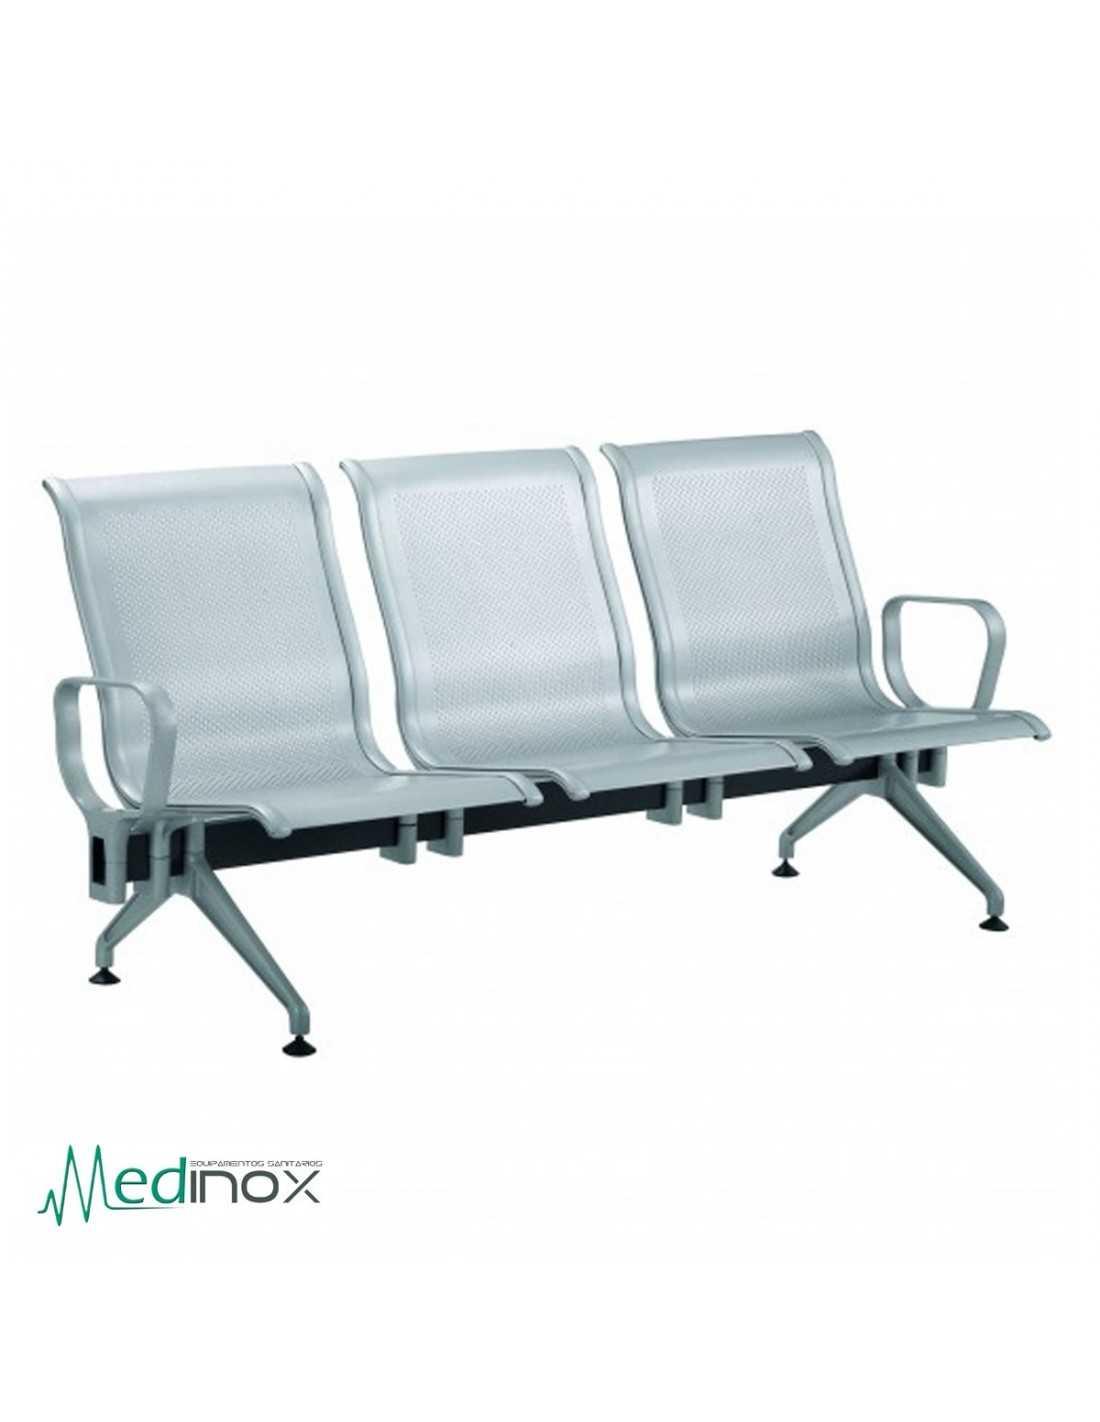 Sillas sala espera RLJAVA3 bancada 3 sillas de espera en